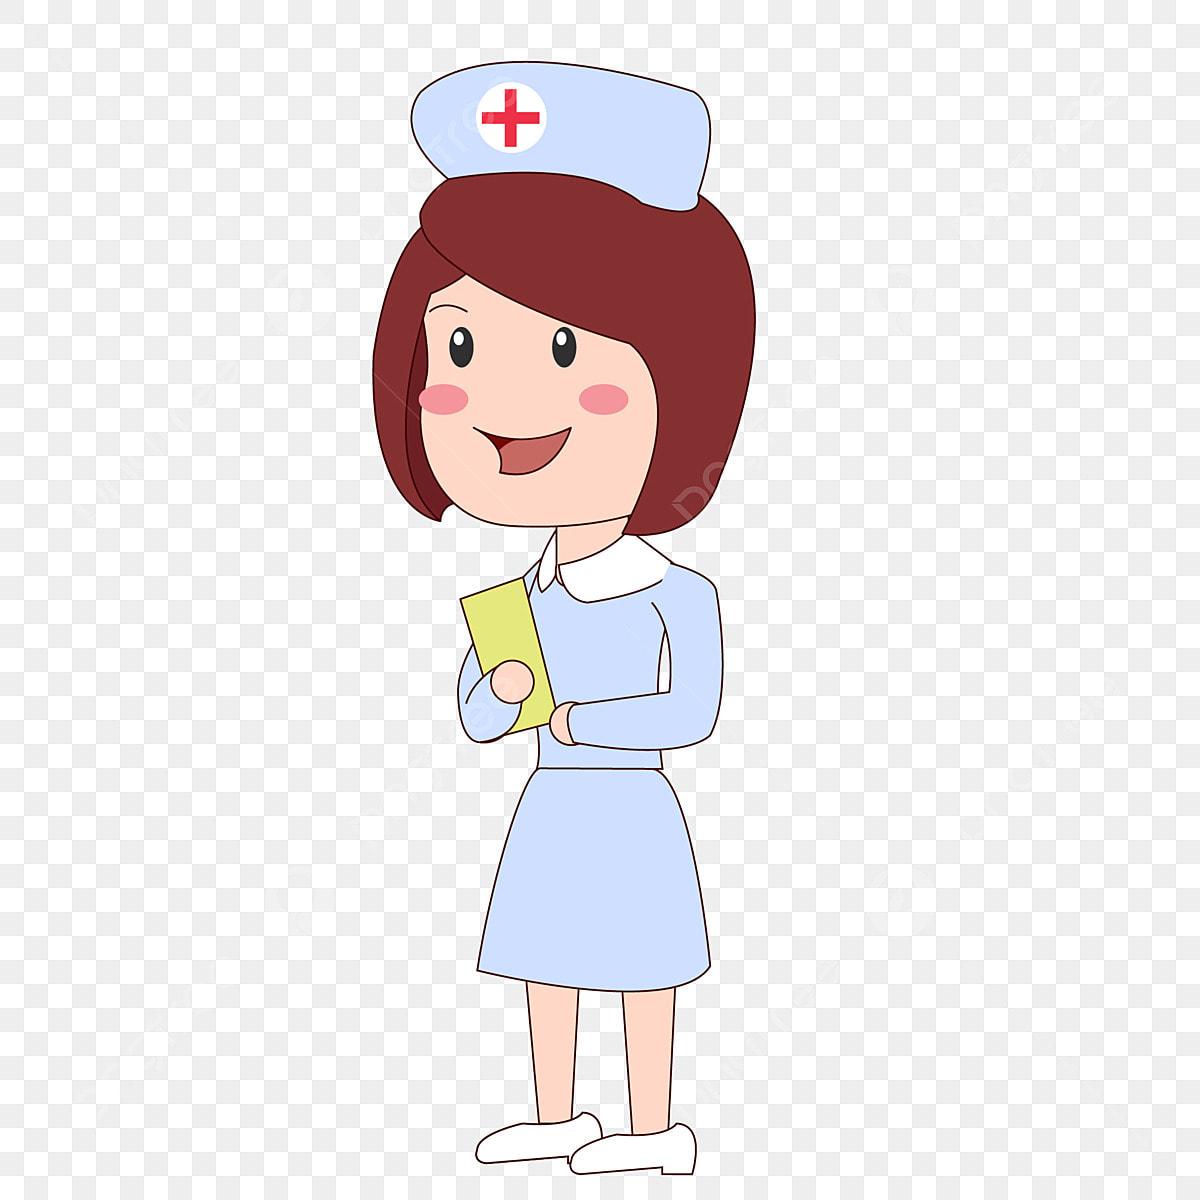 Free Nurse Clip Art   Royalty-Free (RF) Nurse Clipart Illustration by Maria  Bell - Stock ...   Nurse clip art, Clip art, Illustration